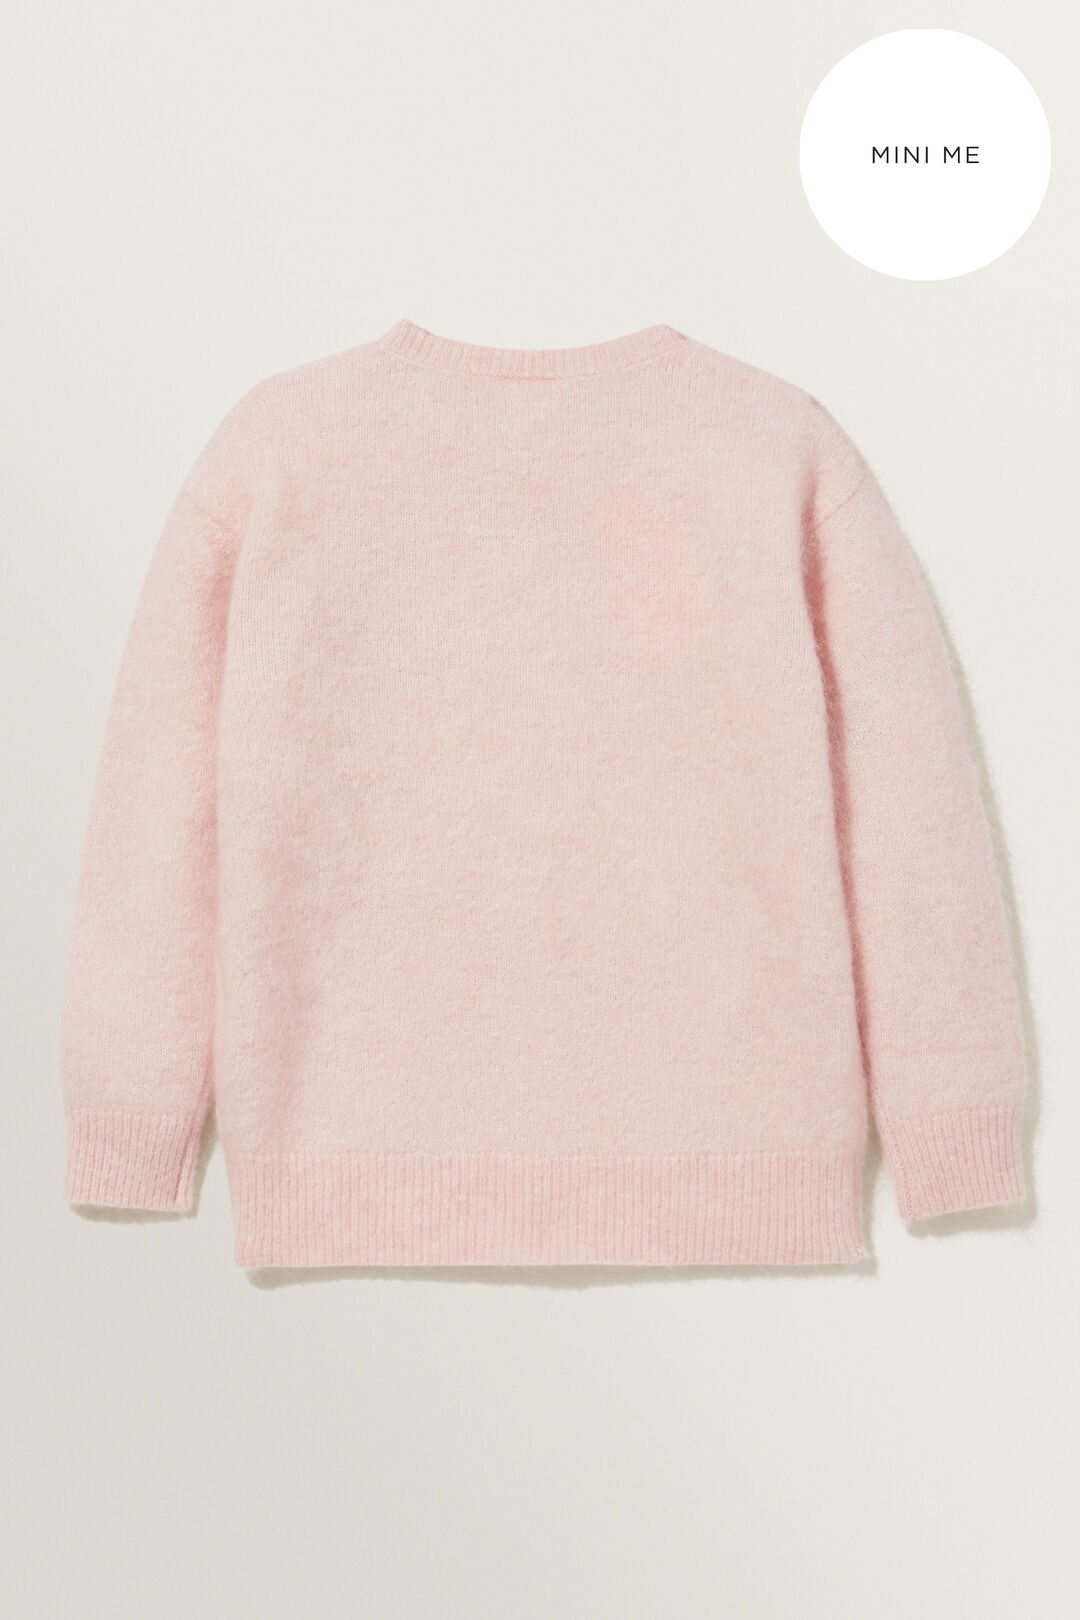 Mohair Blend Sweater  ASH PINK MARLE  hi-res